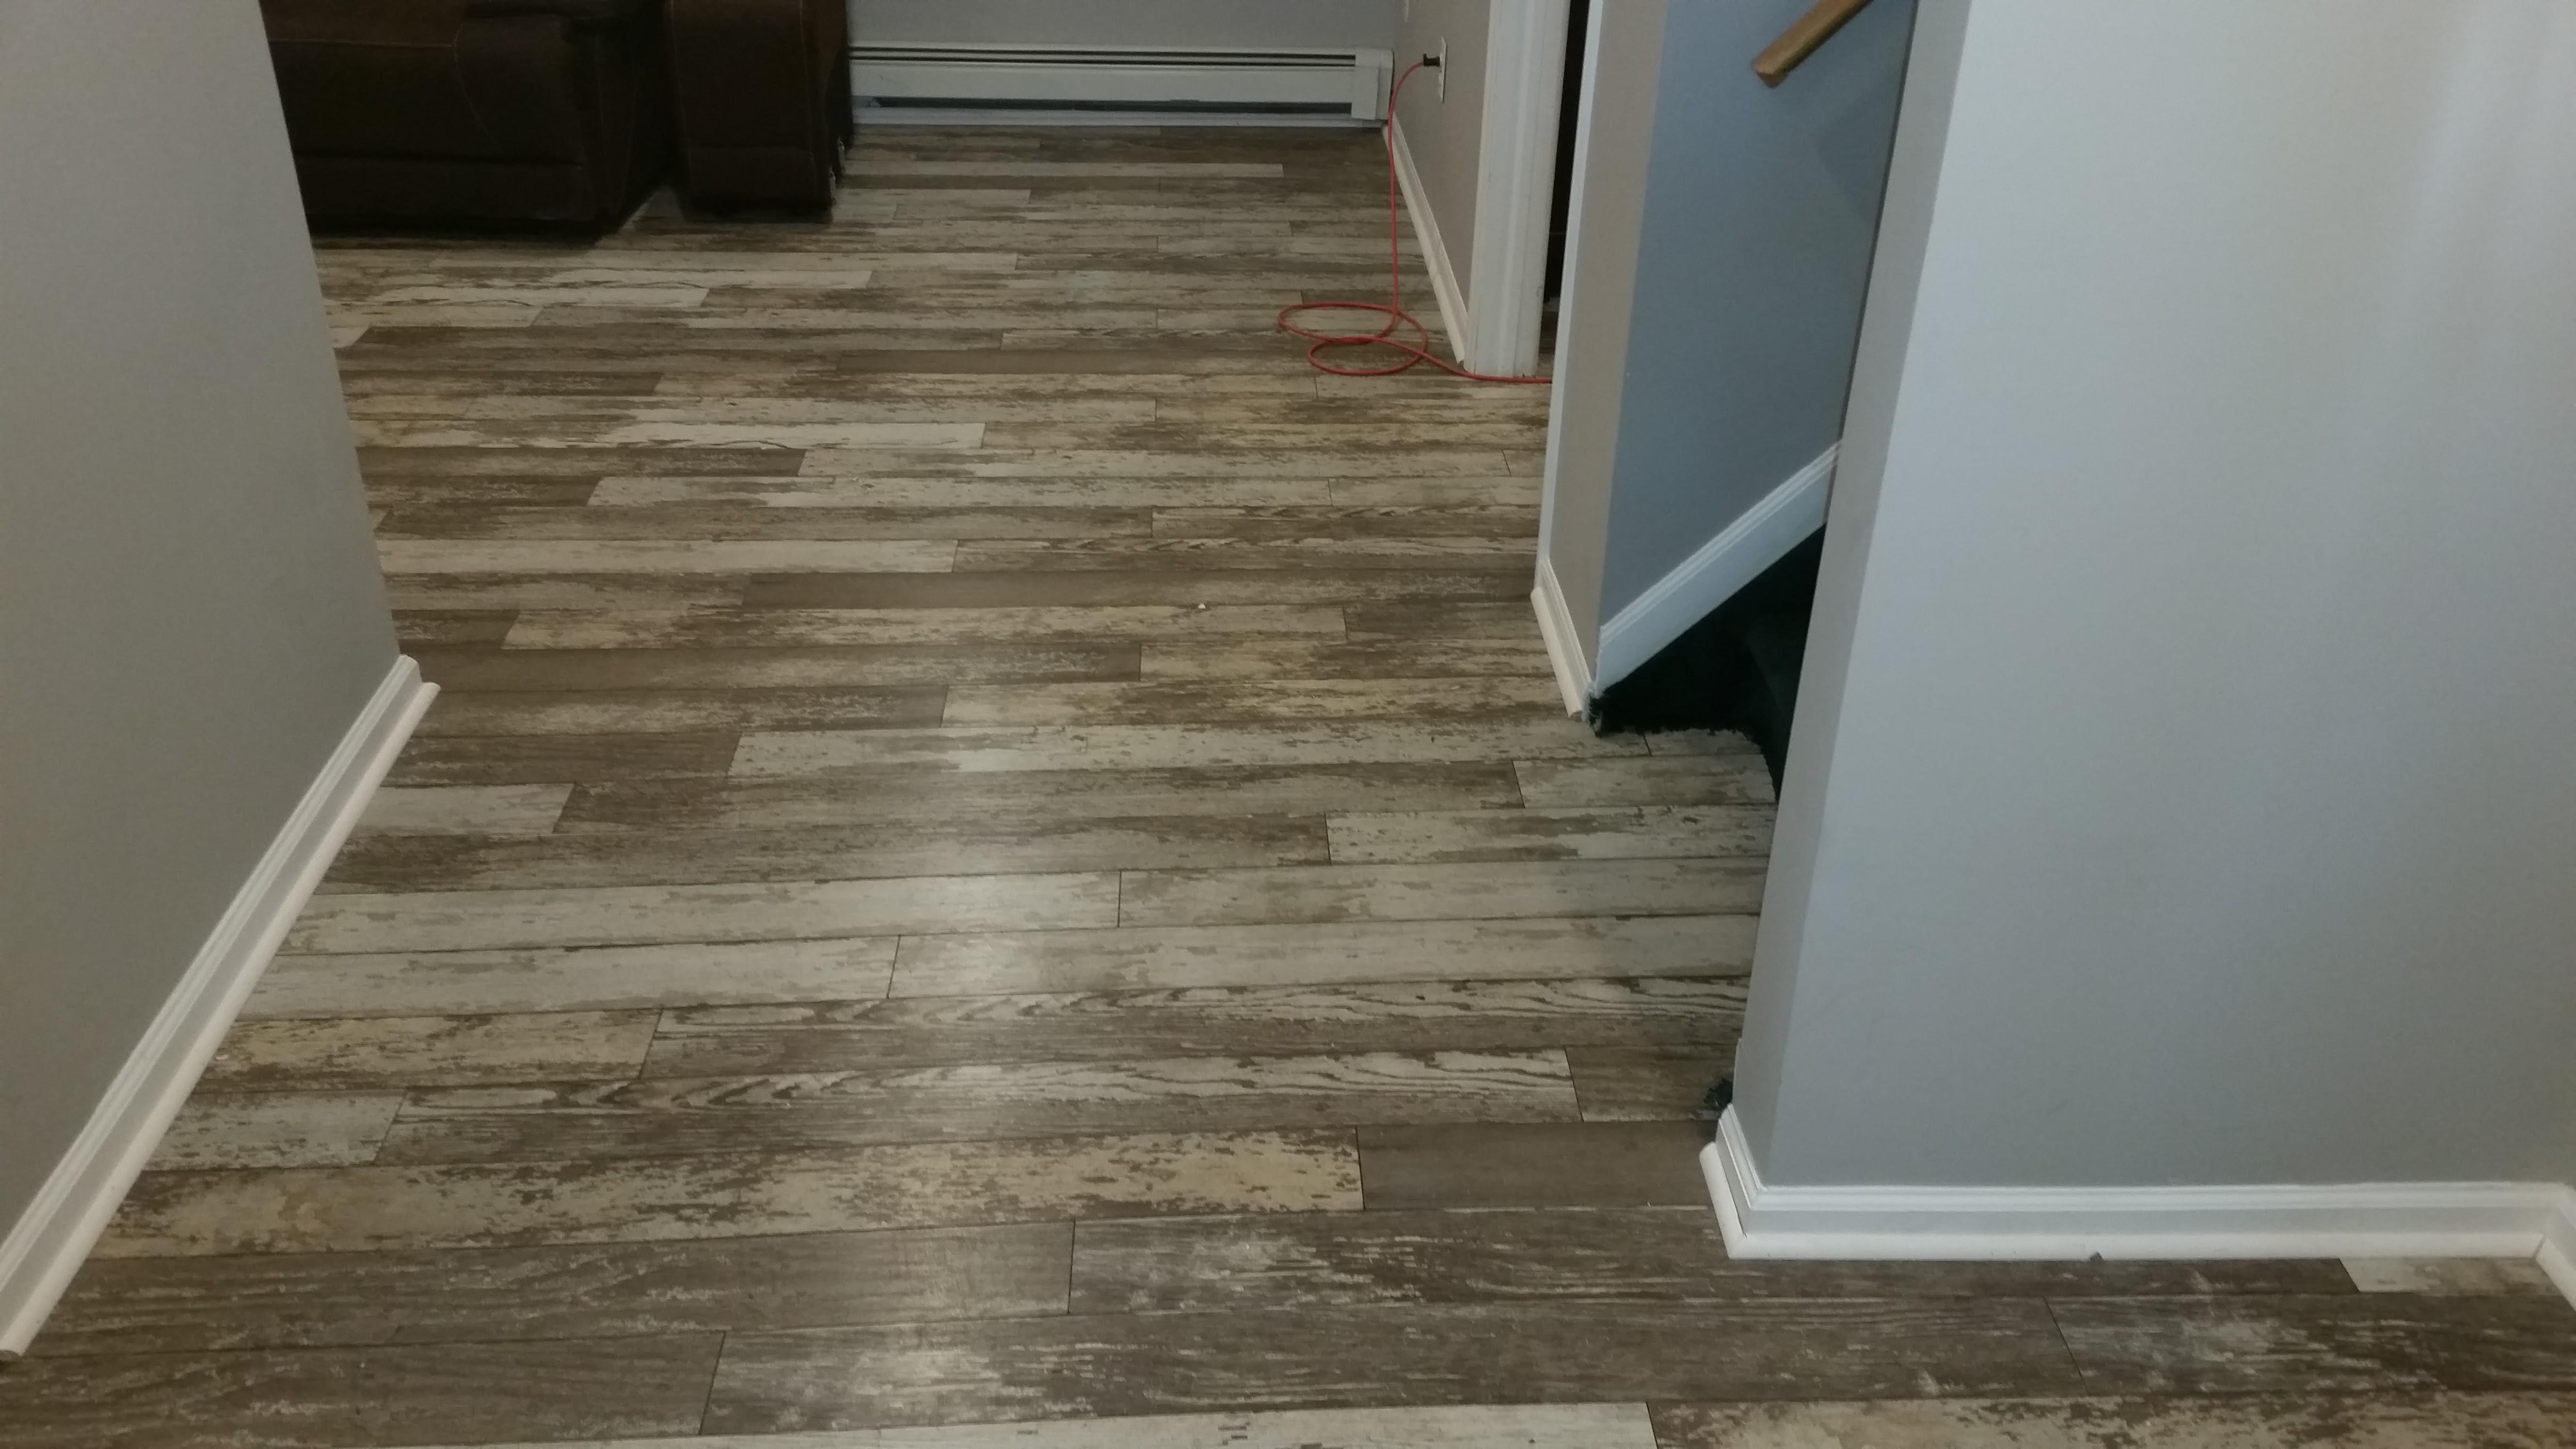 Flooring Installation, Hardwood Floors, Vinyl Floors, Flooring Contractor:  Plainfield, NJ: Au0026M Home Improvements